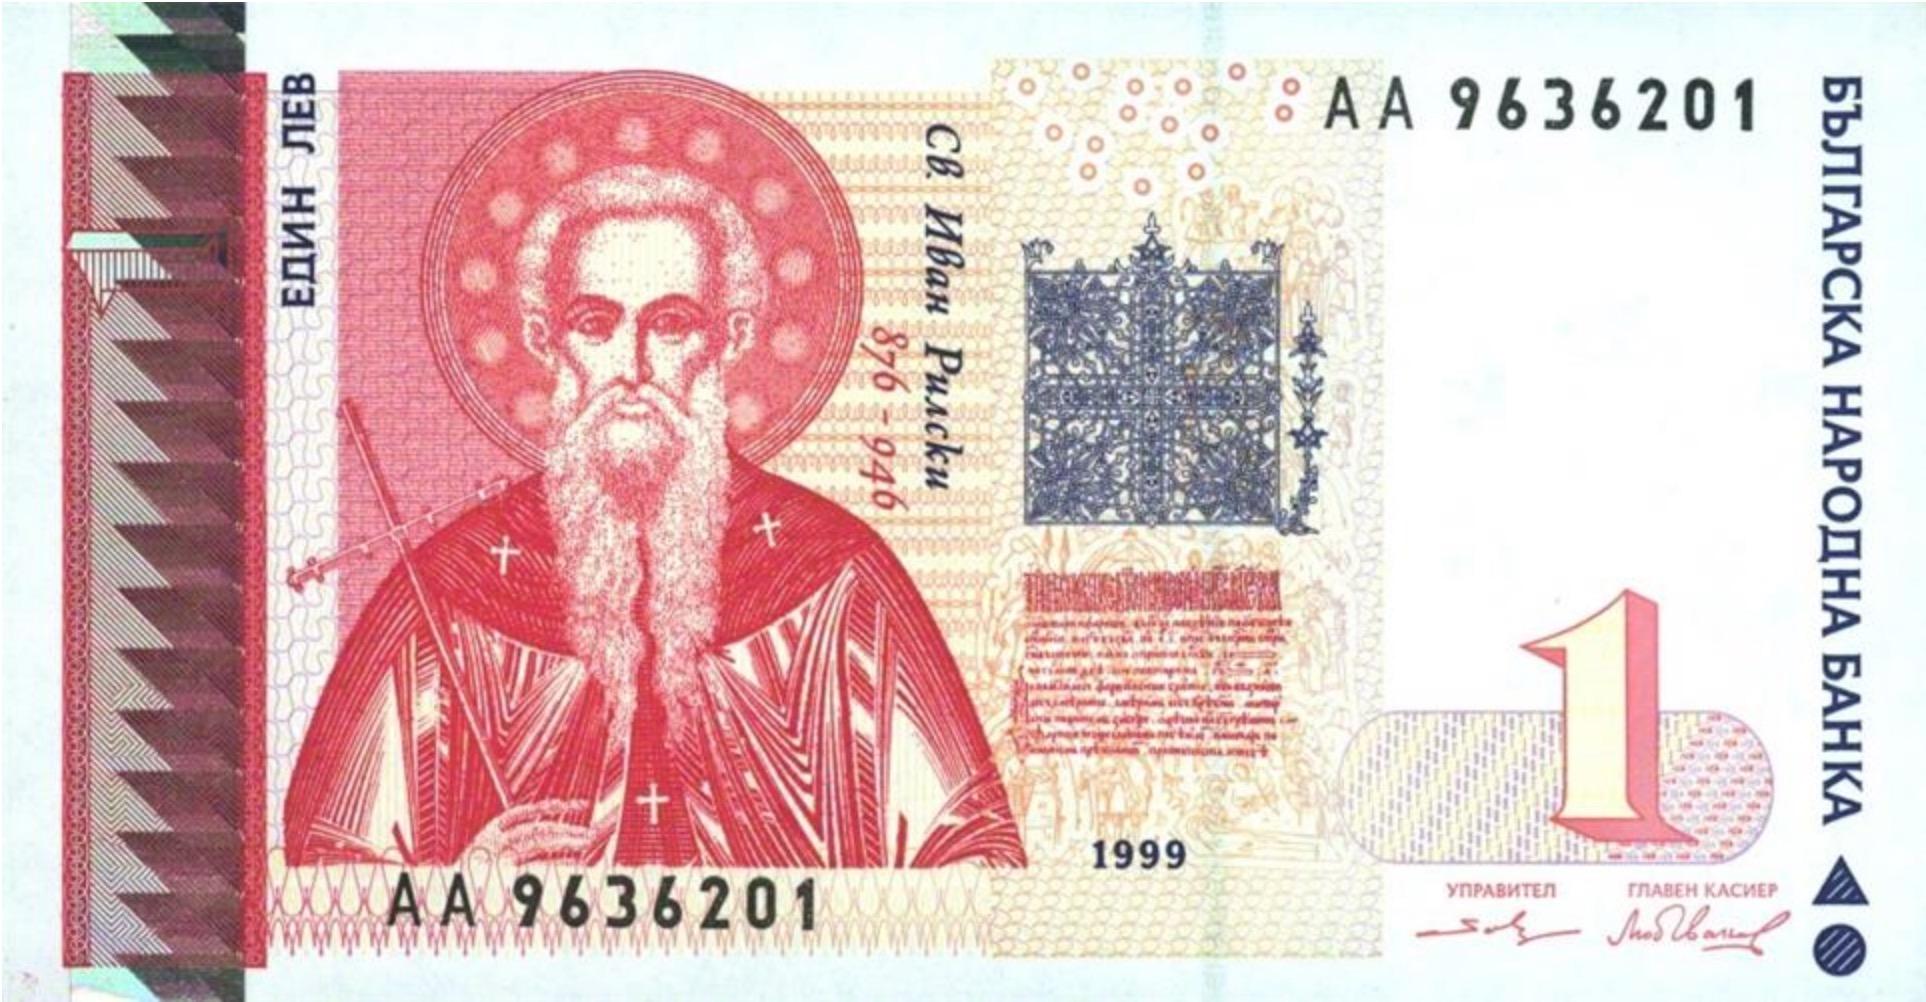 1 Bulgarian Lev banknote